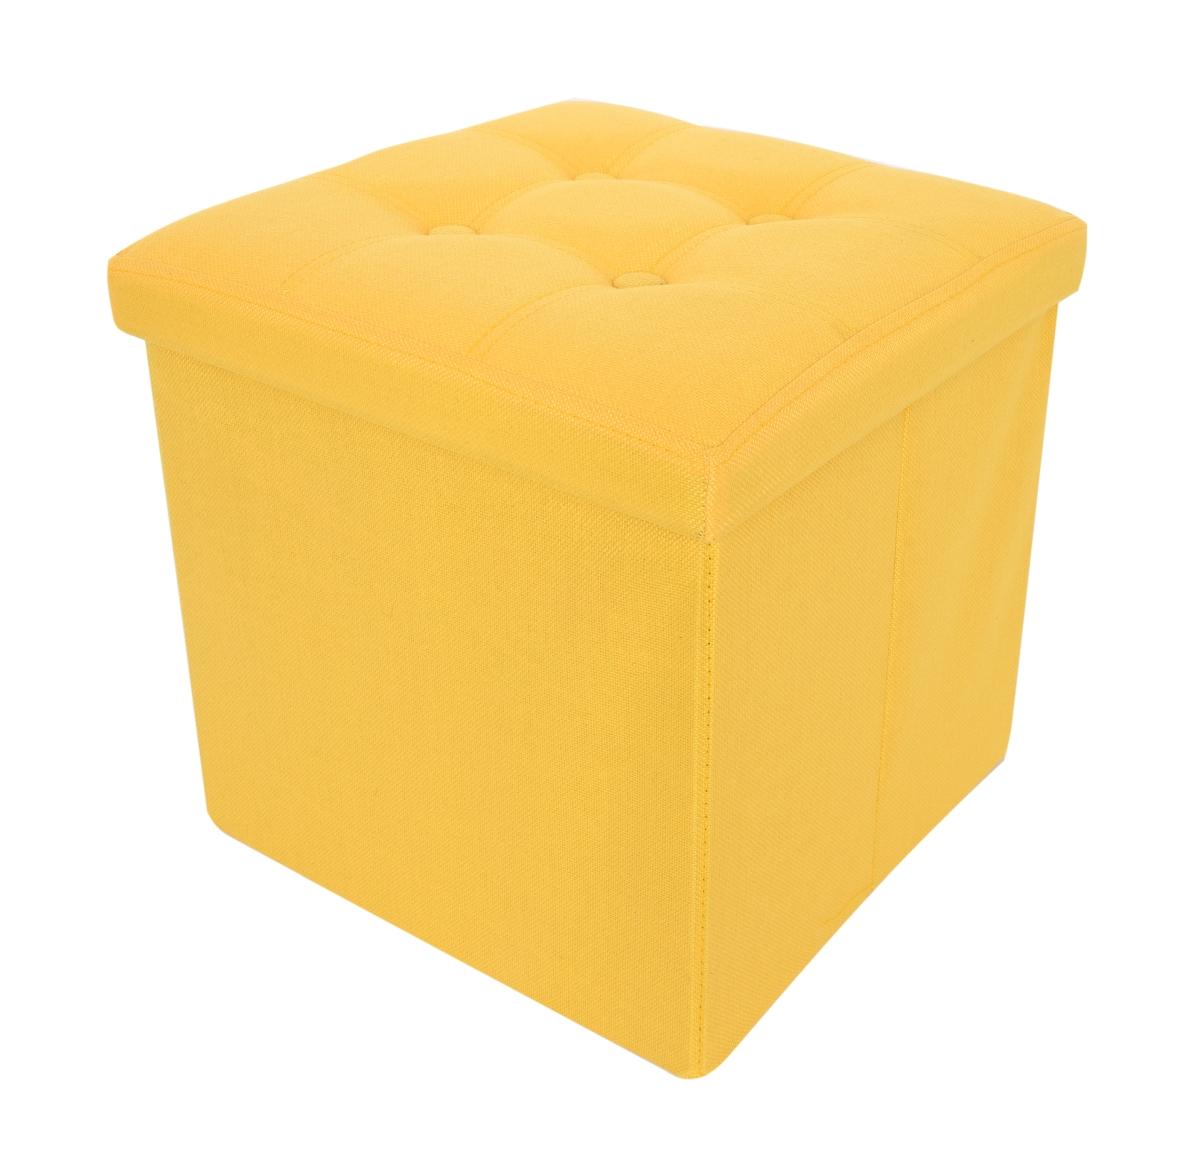 https://dedra.blob.core.windows.net/cms/ContentItems/22448_sedaci-boxer-skladaci-s-uloznym-prostorem-vel-l/images/fc18912-01.jpg